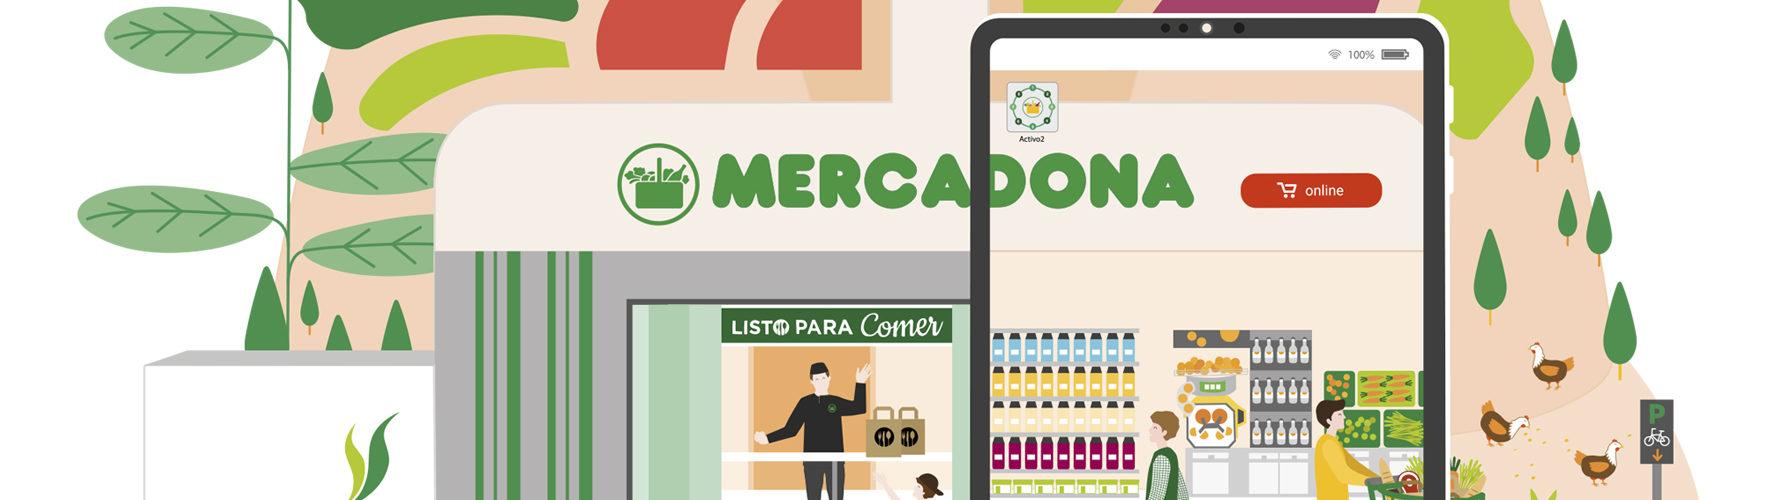 MERCADONA PORTADA MEMORIA ANUAL